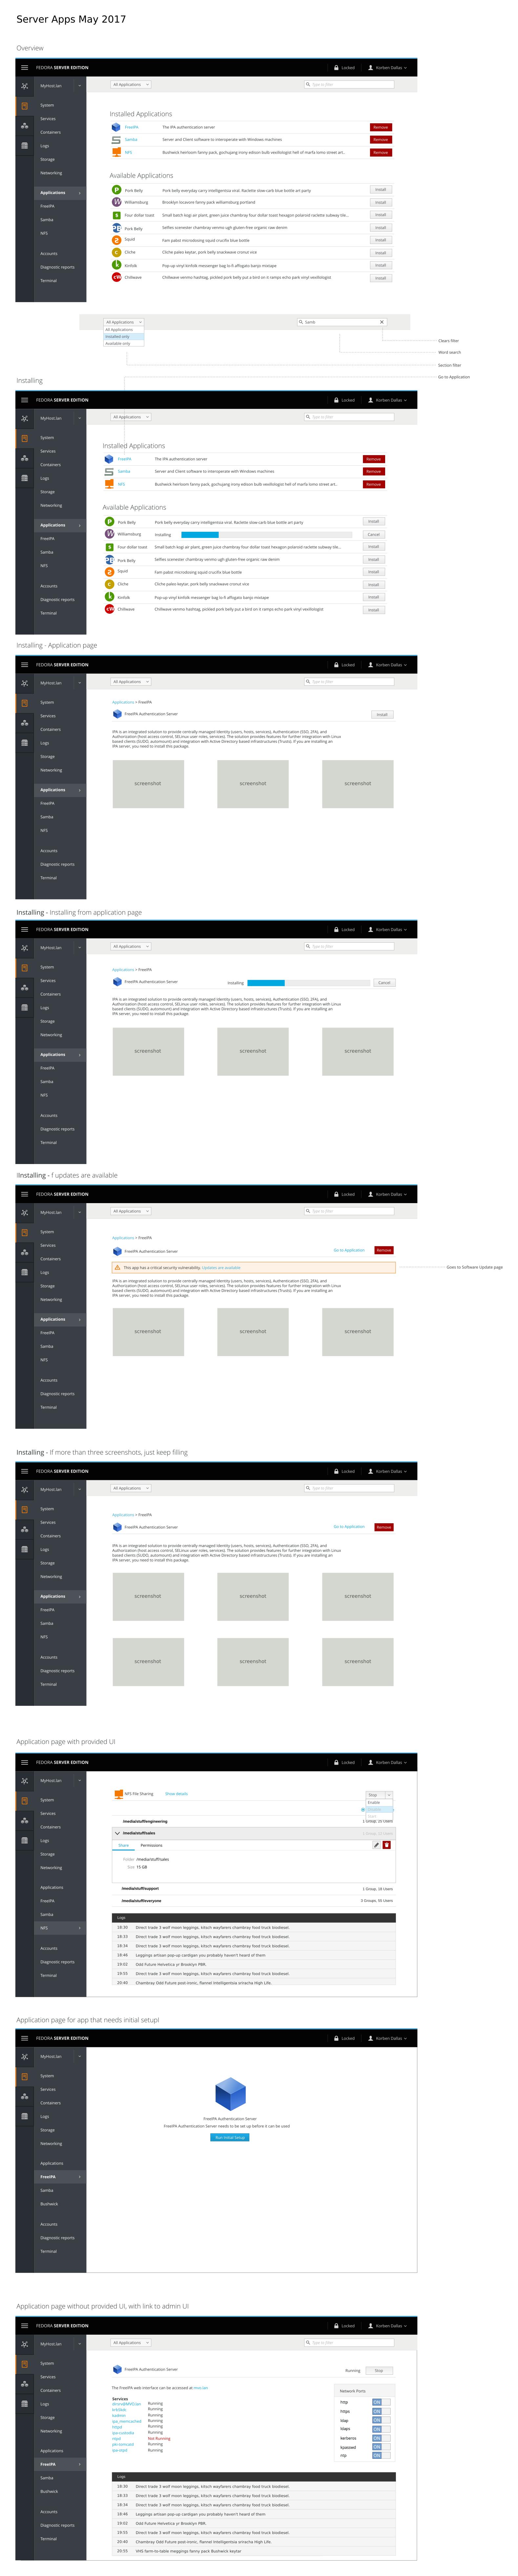 Server Applications · cockpit-project/cockpit Wiki · GitHub